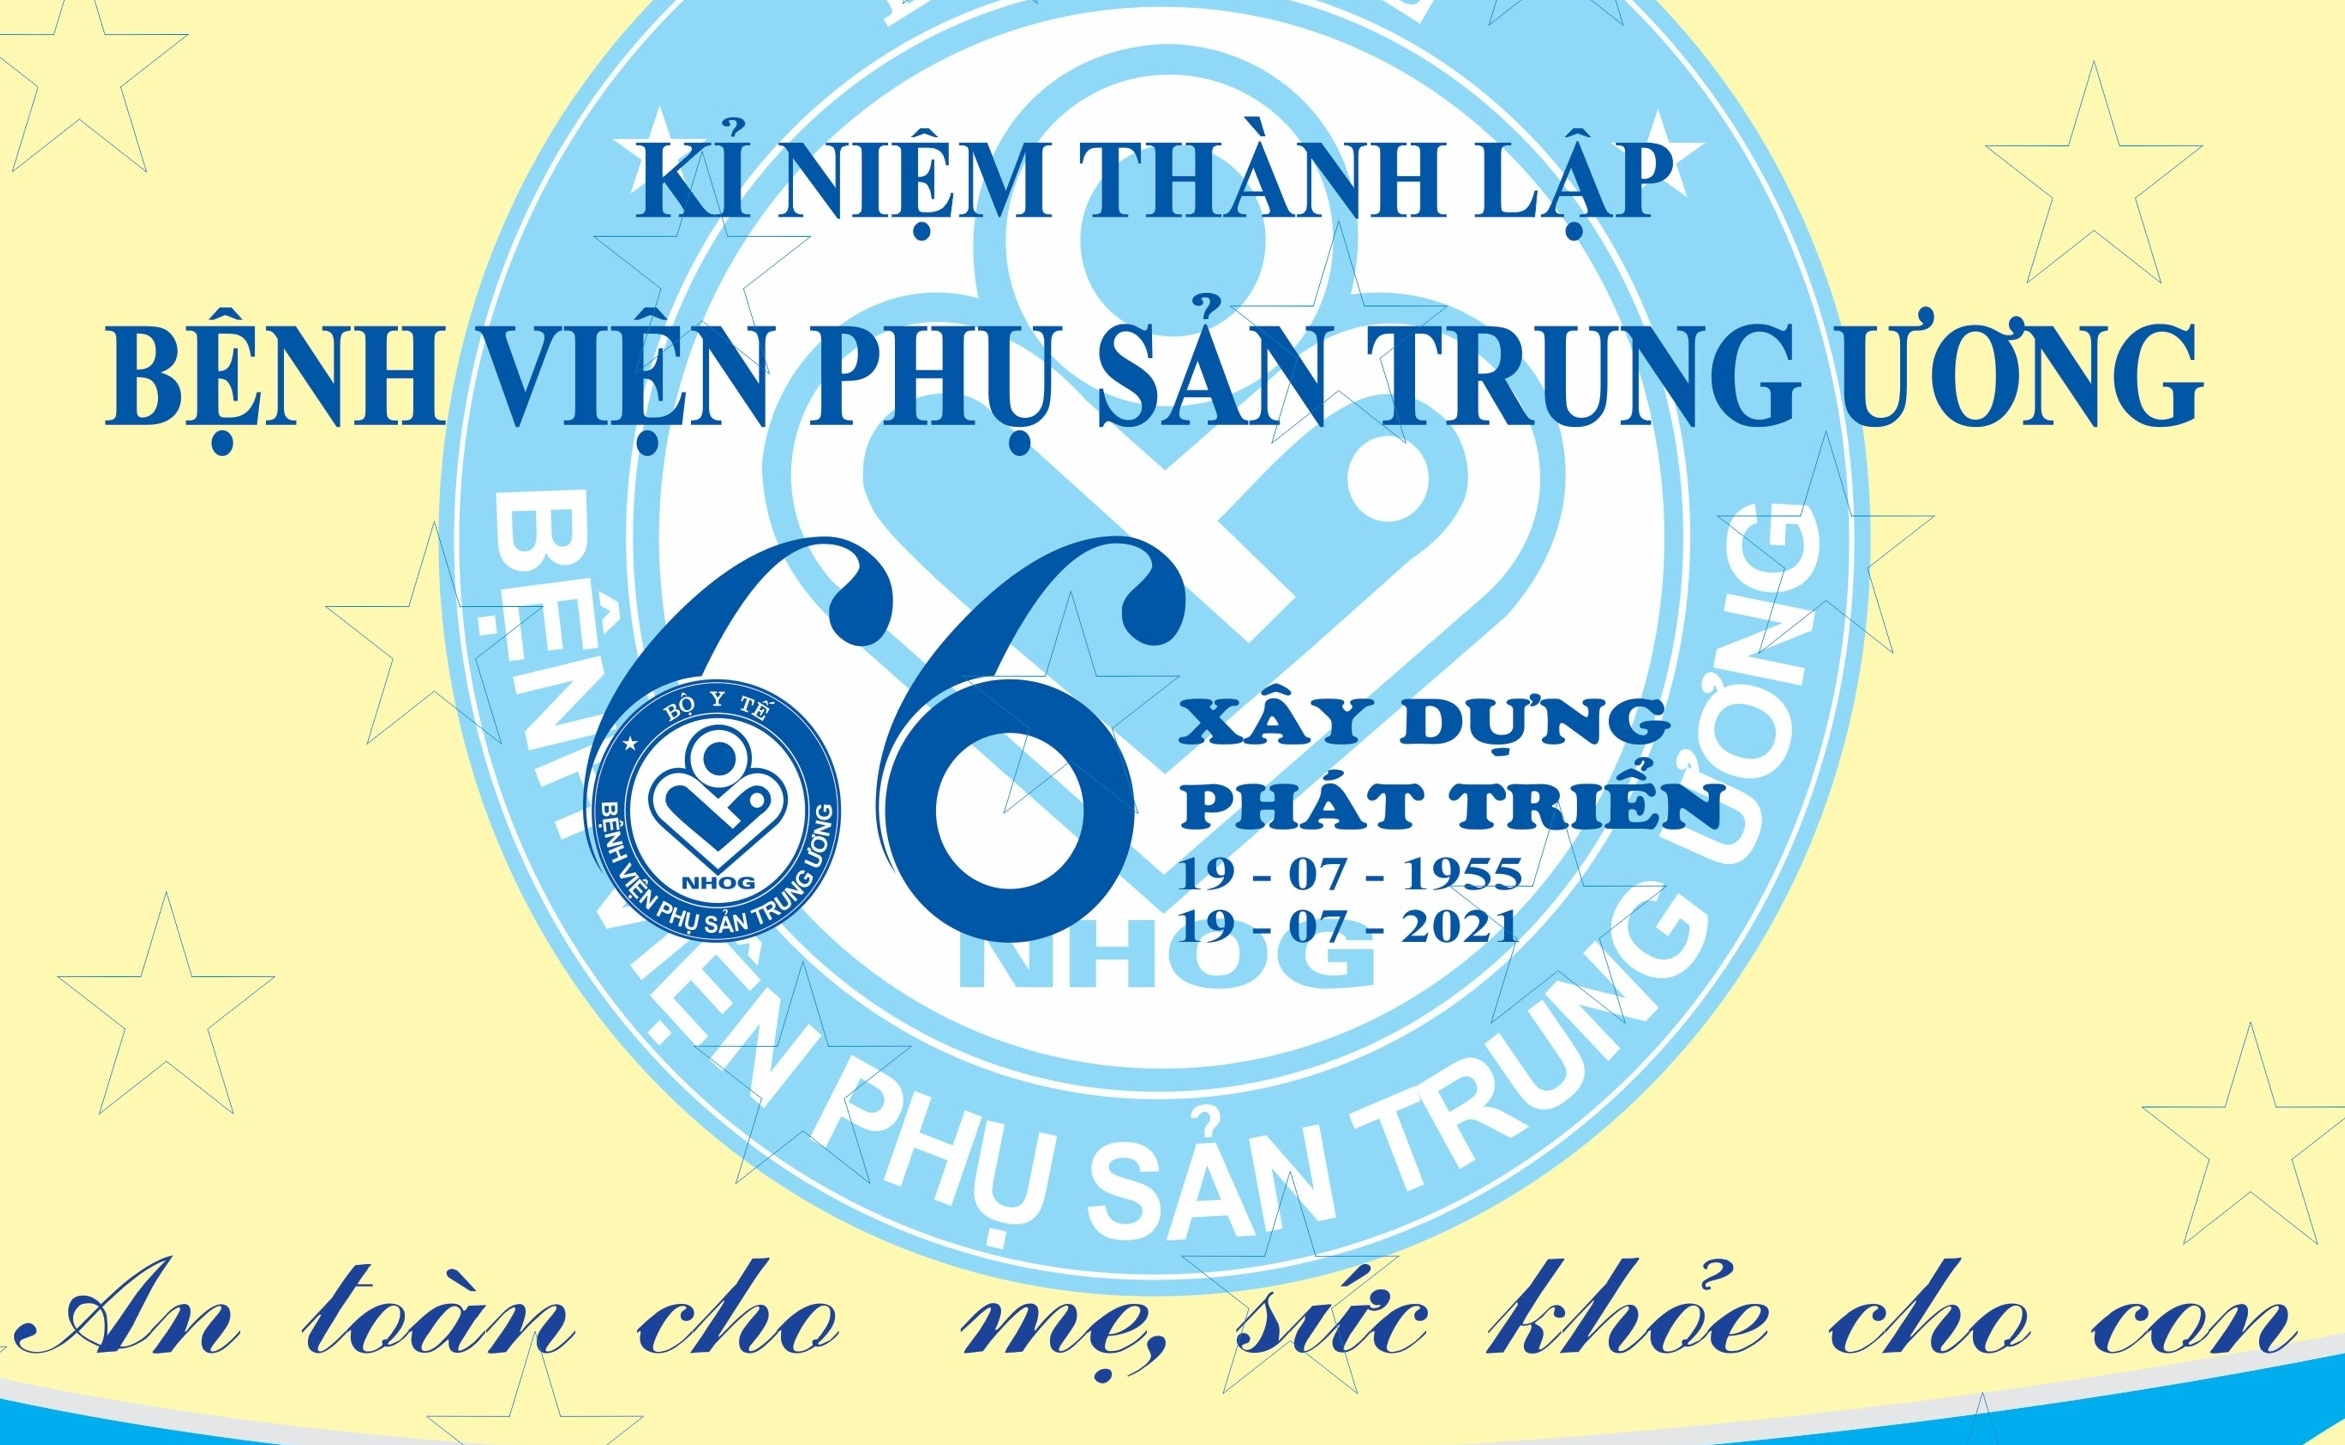 http://admin.tt.doisong.vn/stores/news_dataimages/vtkien/072021/20/08/croped/Picture1.jpg